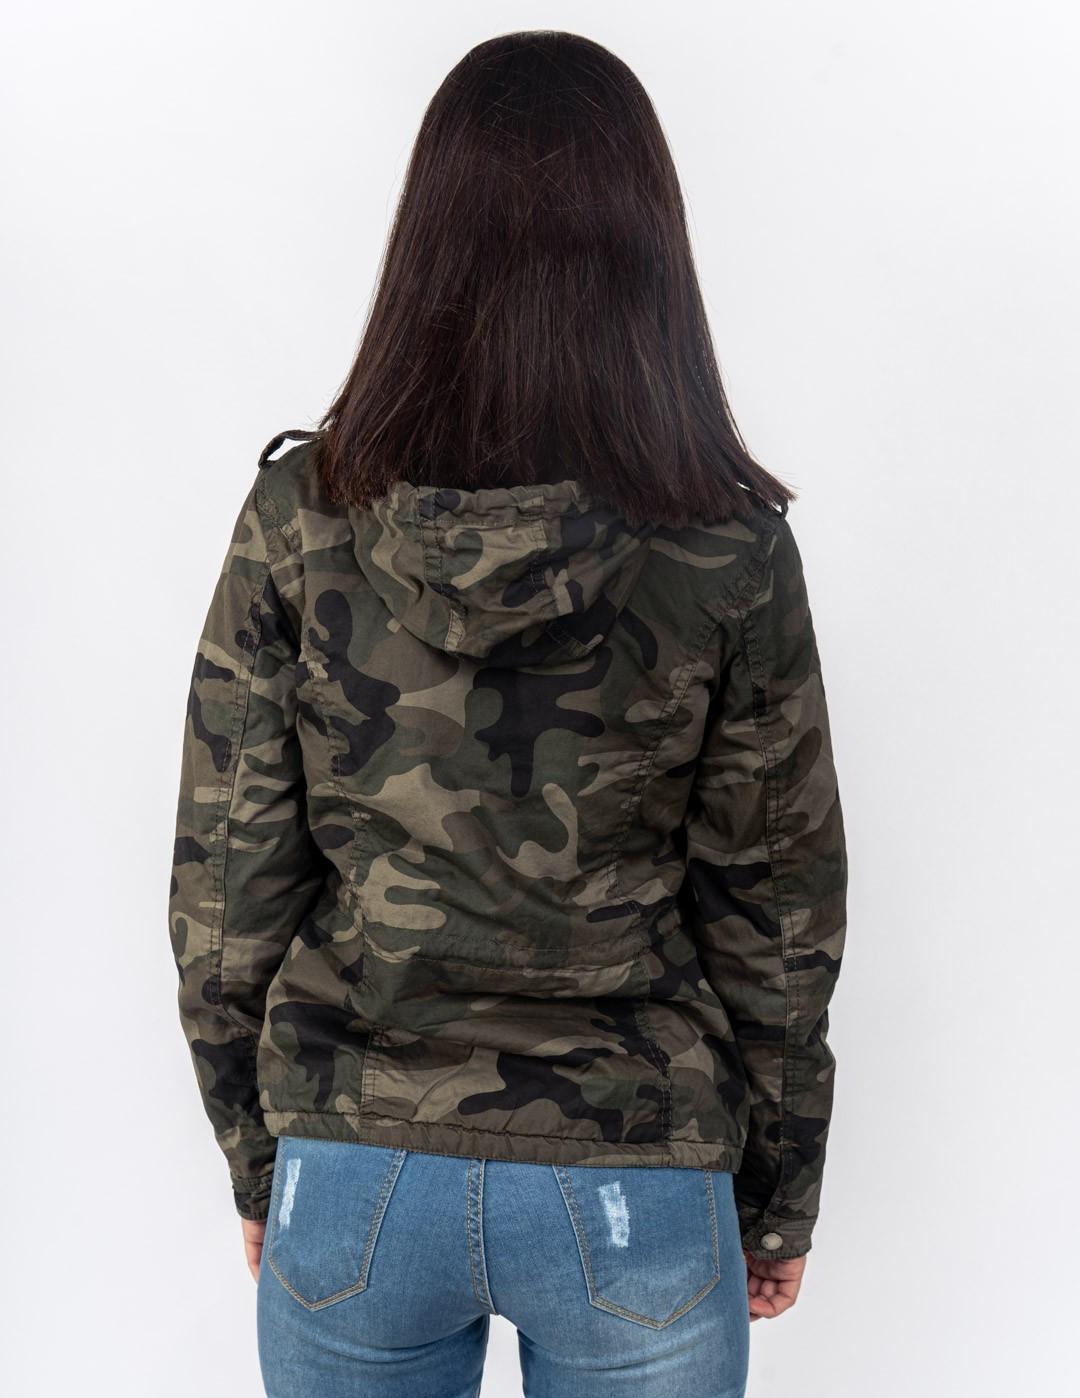 SOLDIER Jacket 3D Logo